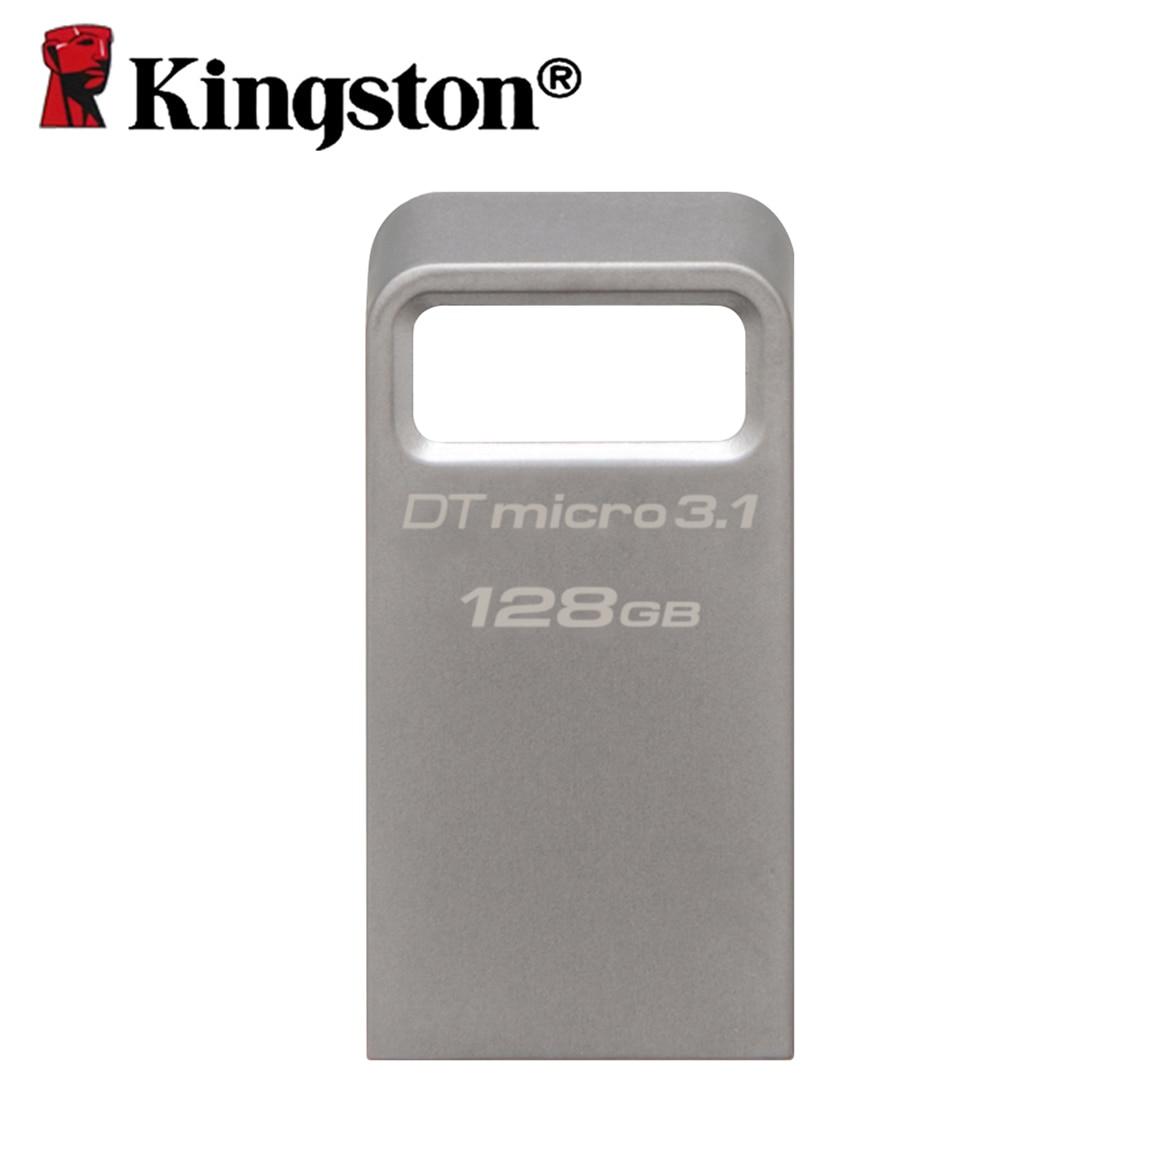 Mini Compact Metal 32GB USB 2.0 Pen Drive Flash Drive Memory Stick Key USB